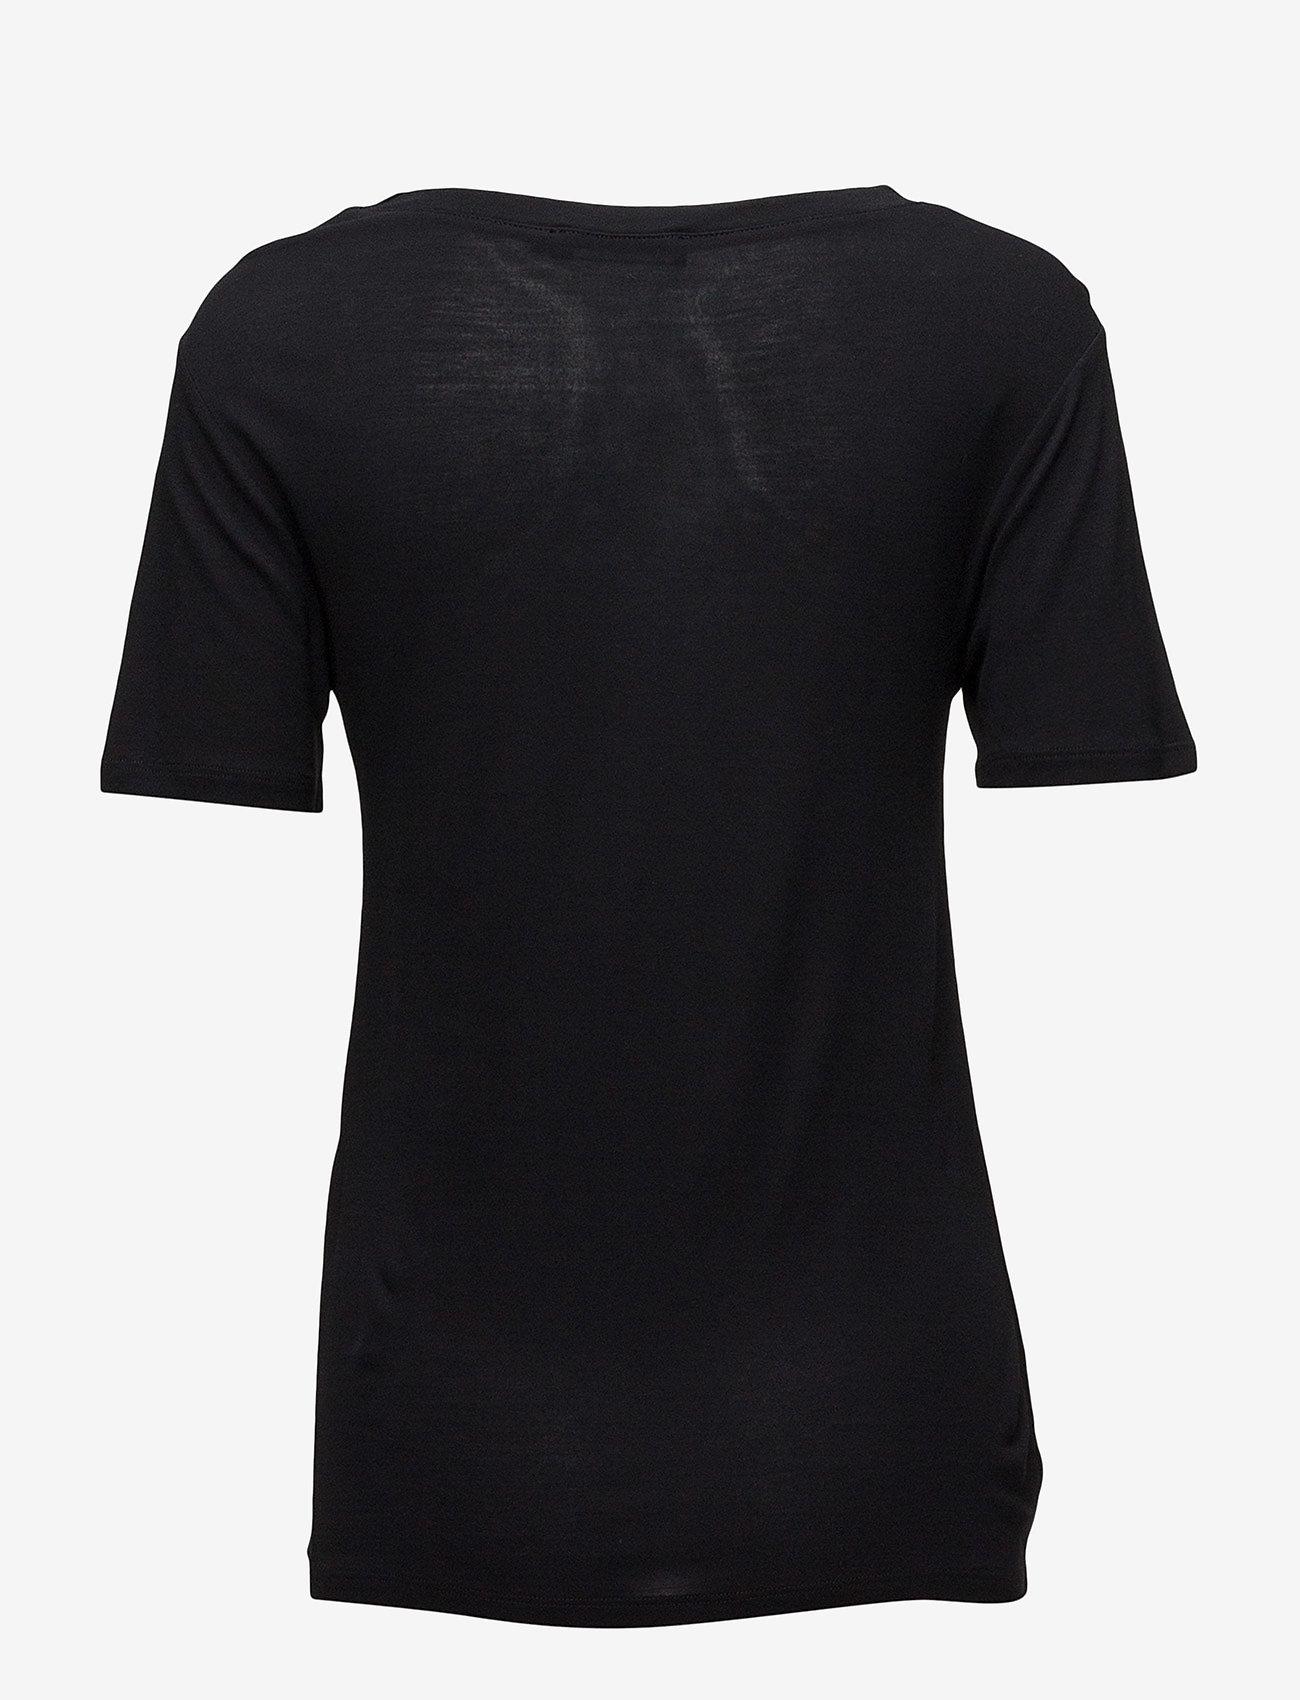 MDK / Munderingskompagniet - Mdk t-shirt - t-shirts - black - 1